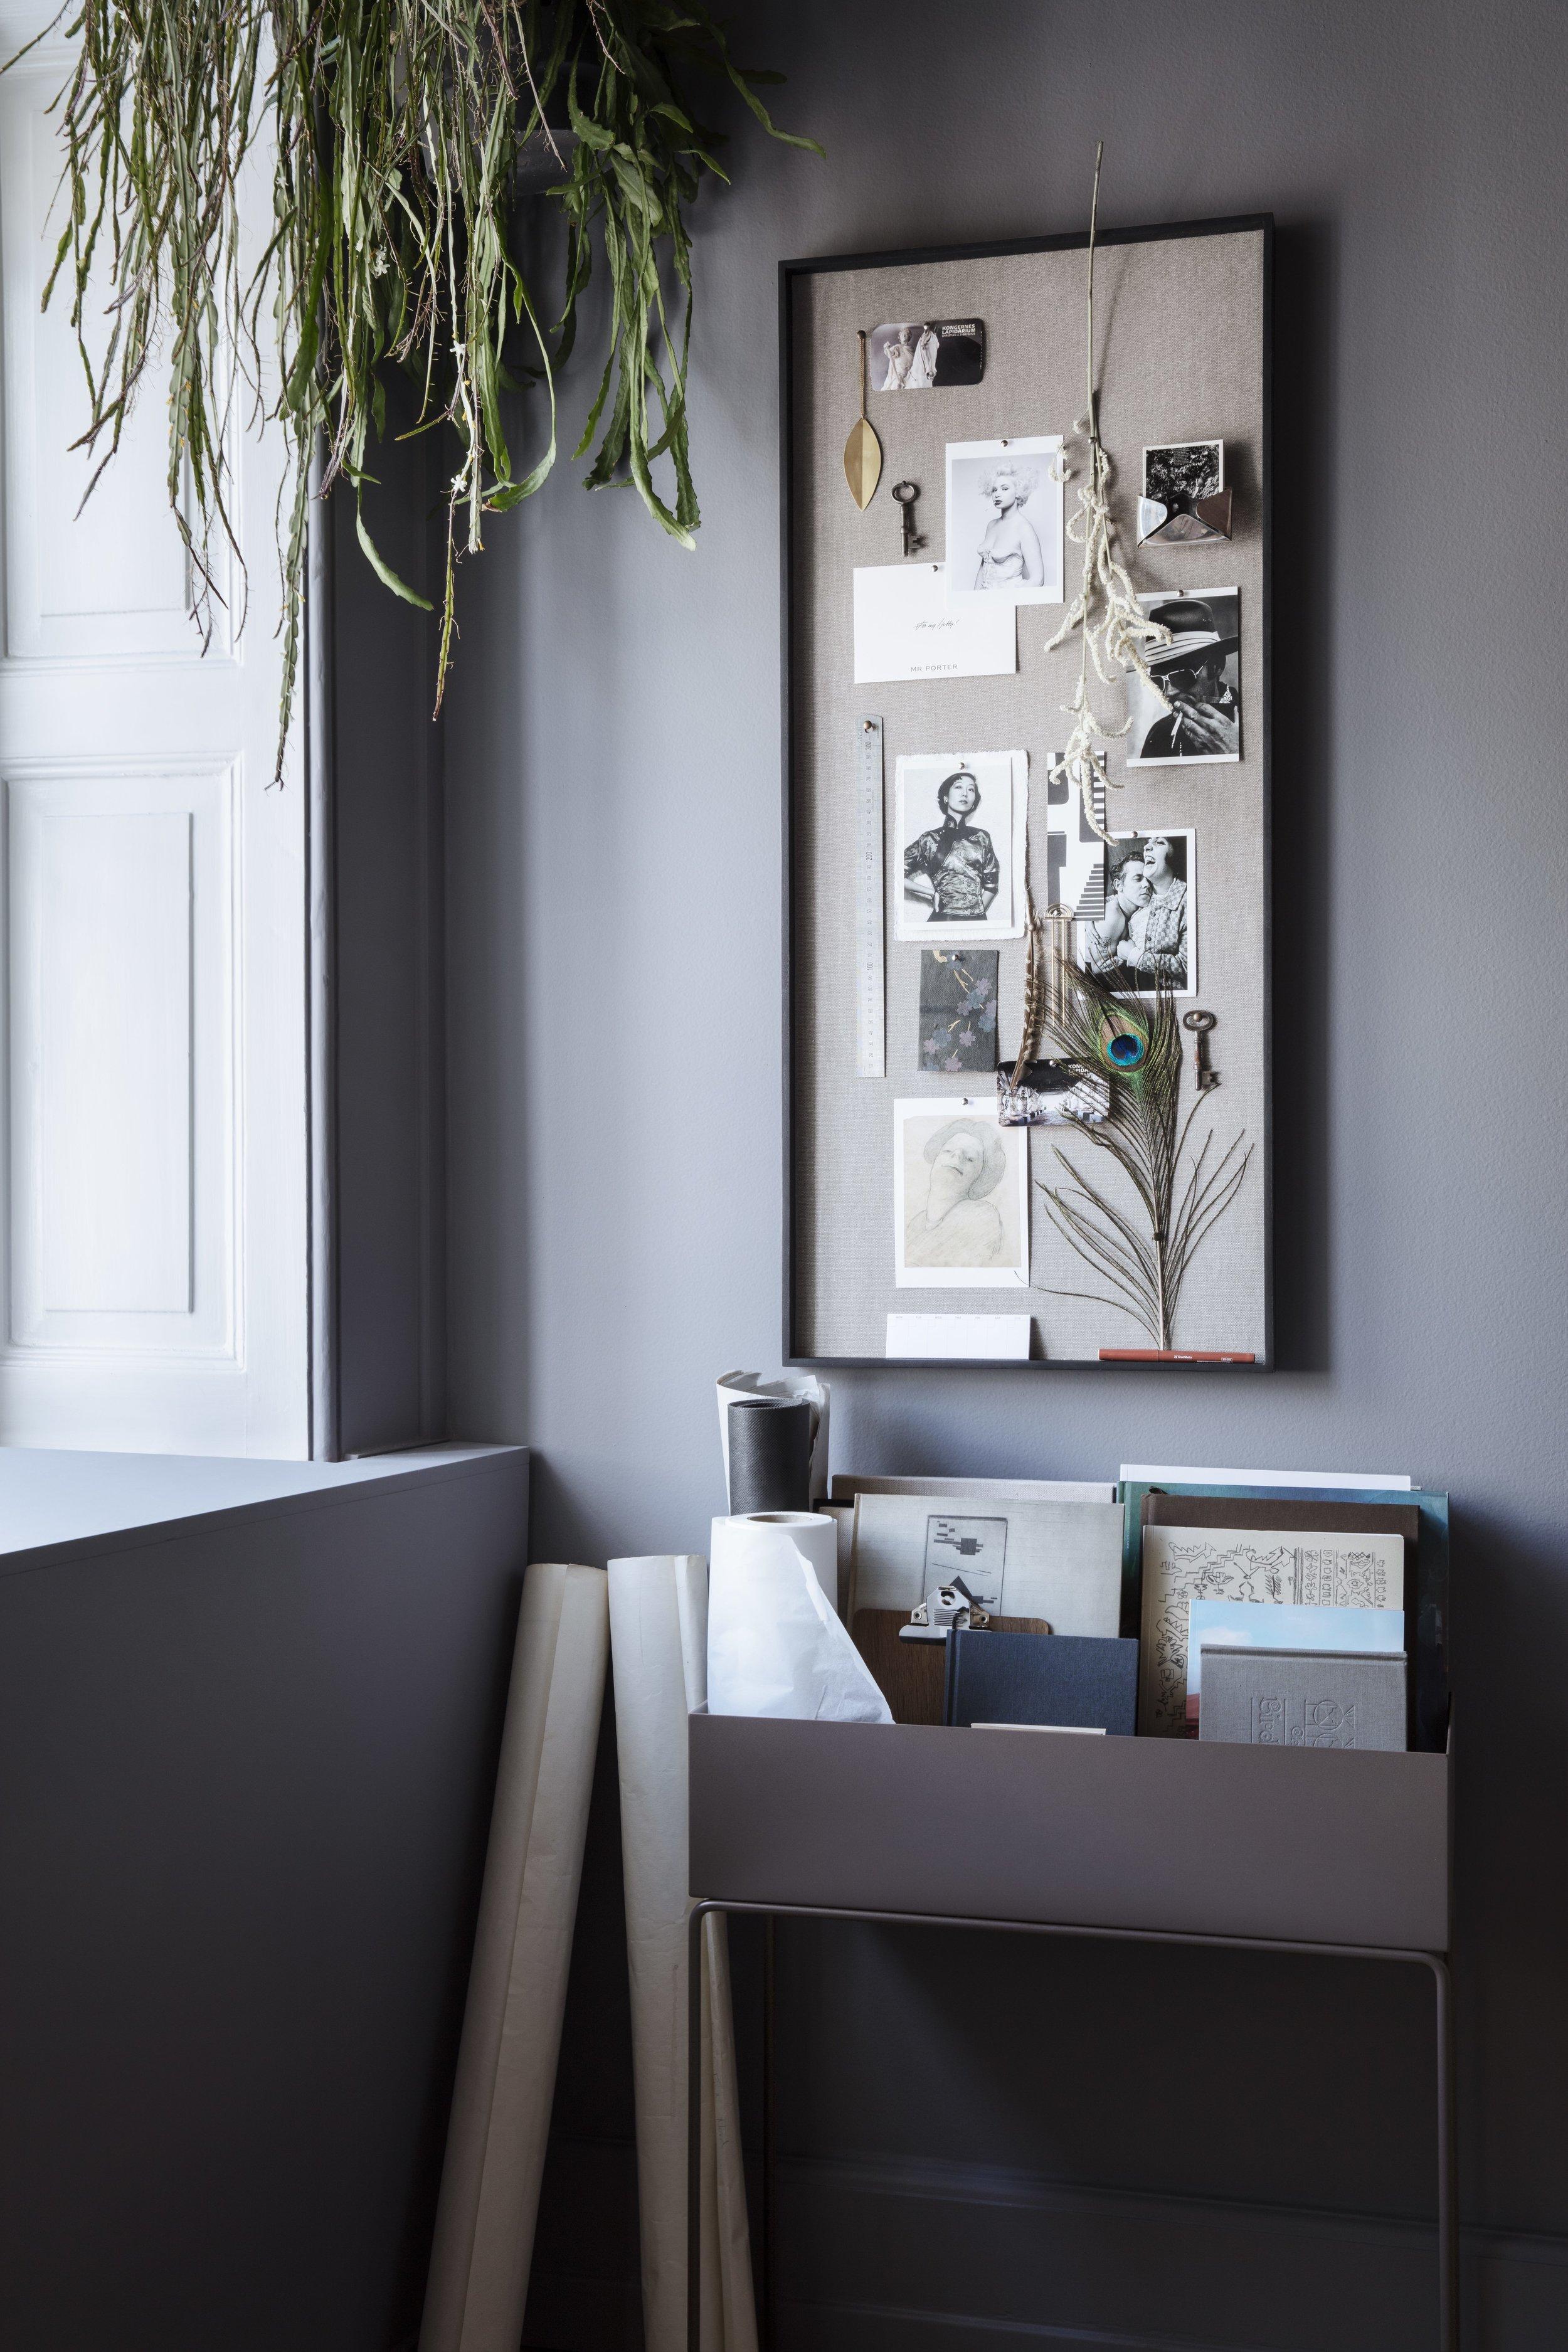 scenery pin board, ferm living, workspace, interiors, scandinavian design.jpg